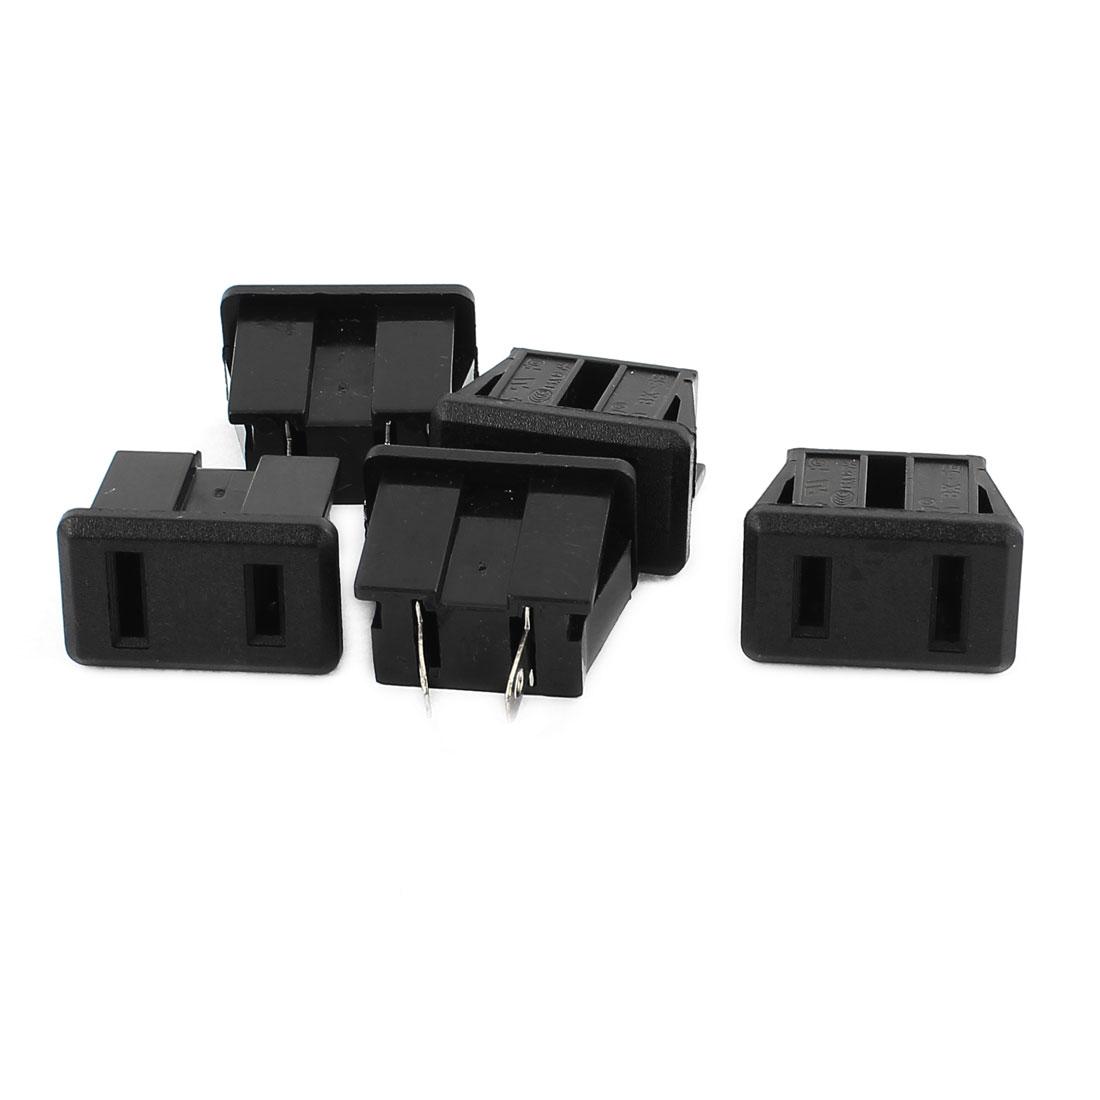 5pcs AC 125V 15A 2P Flat Plug US Power Socket Adapter Black